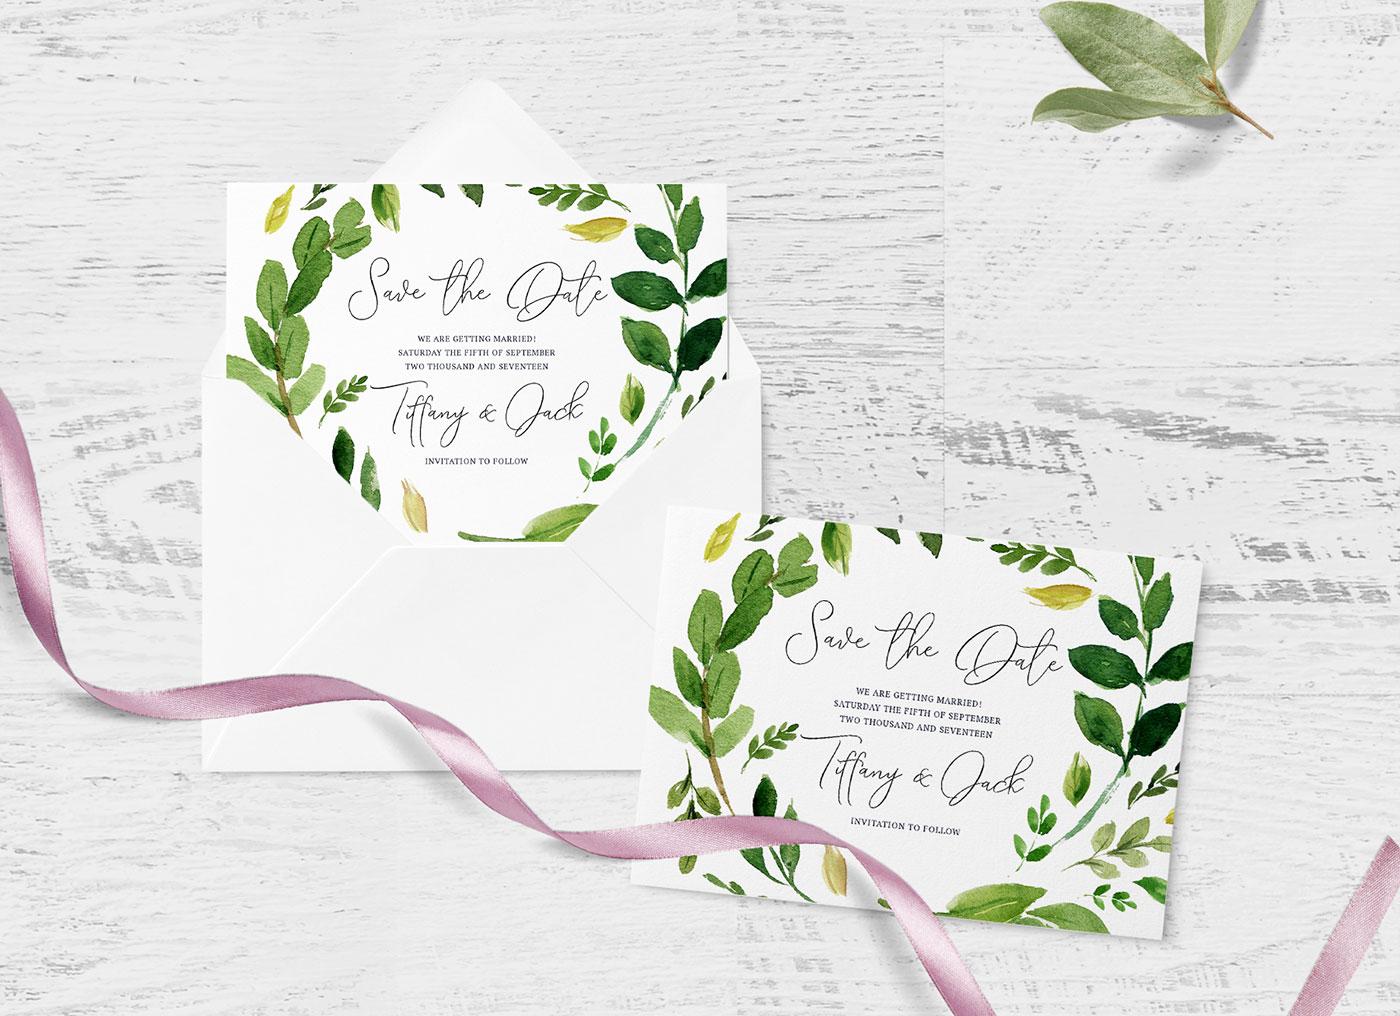 Free wedding invitation card envelop mockup psd good mockups free wedding invitation card envelop mockup psd stopboris Images